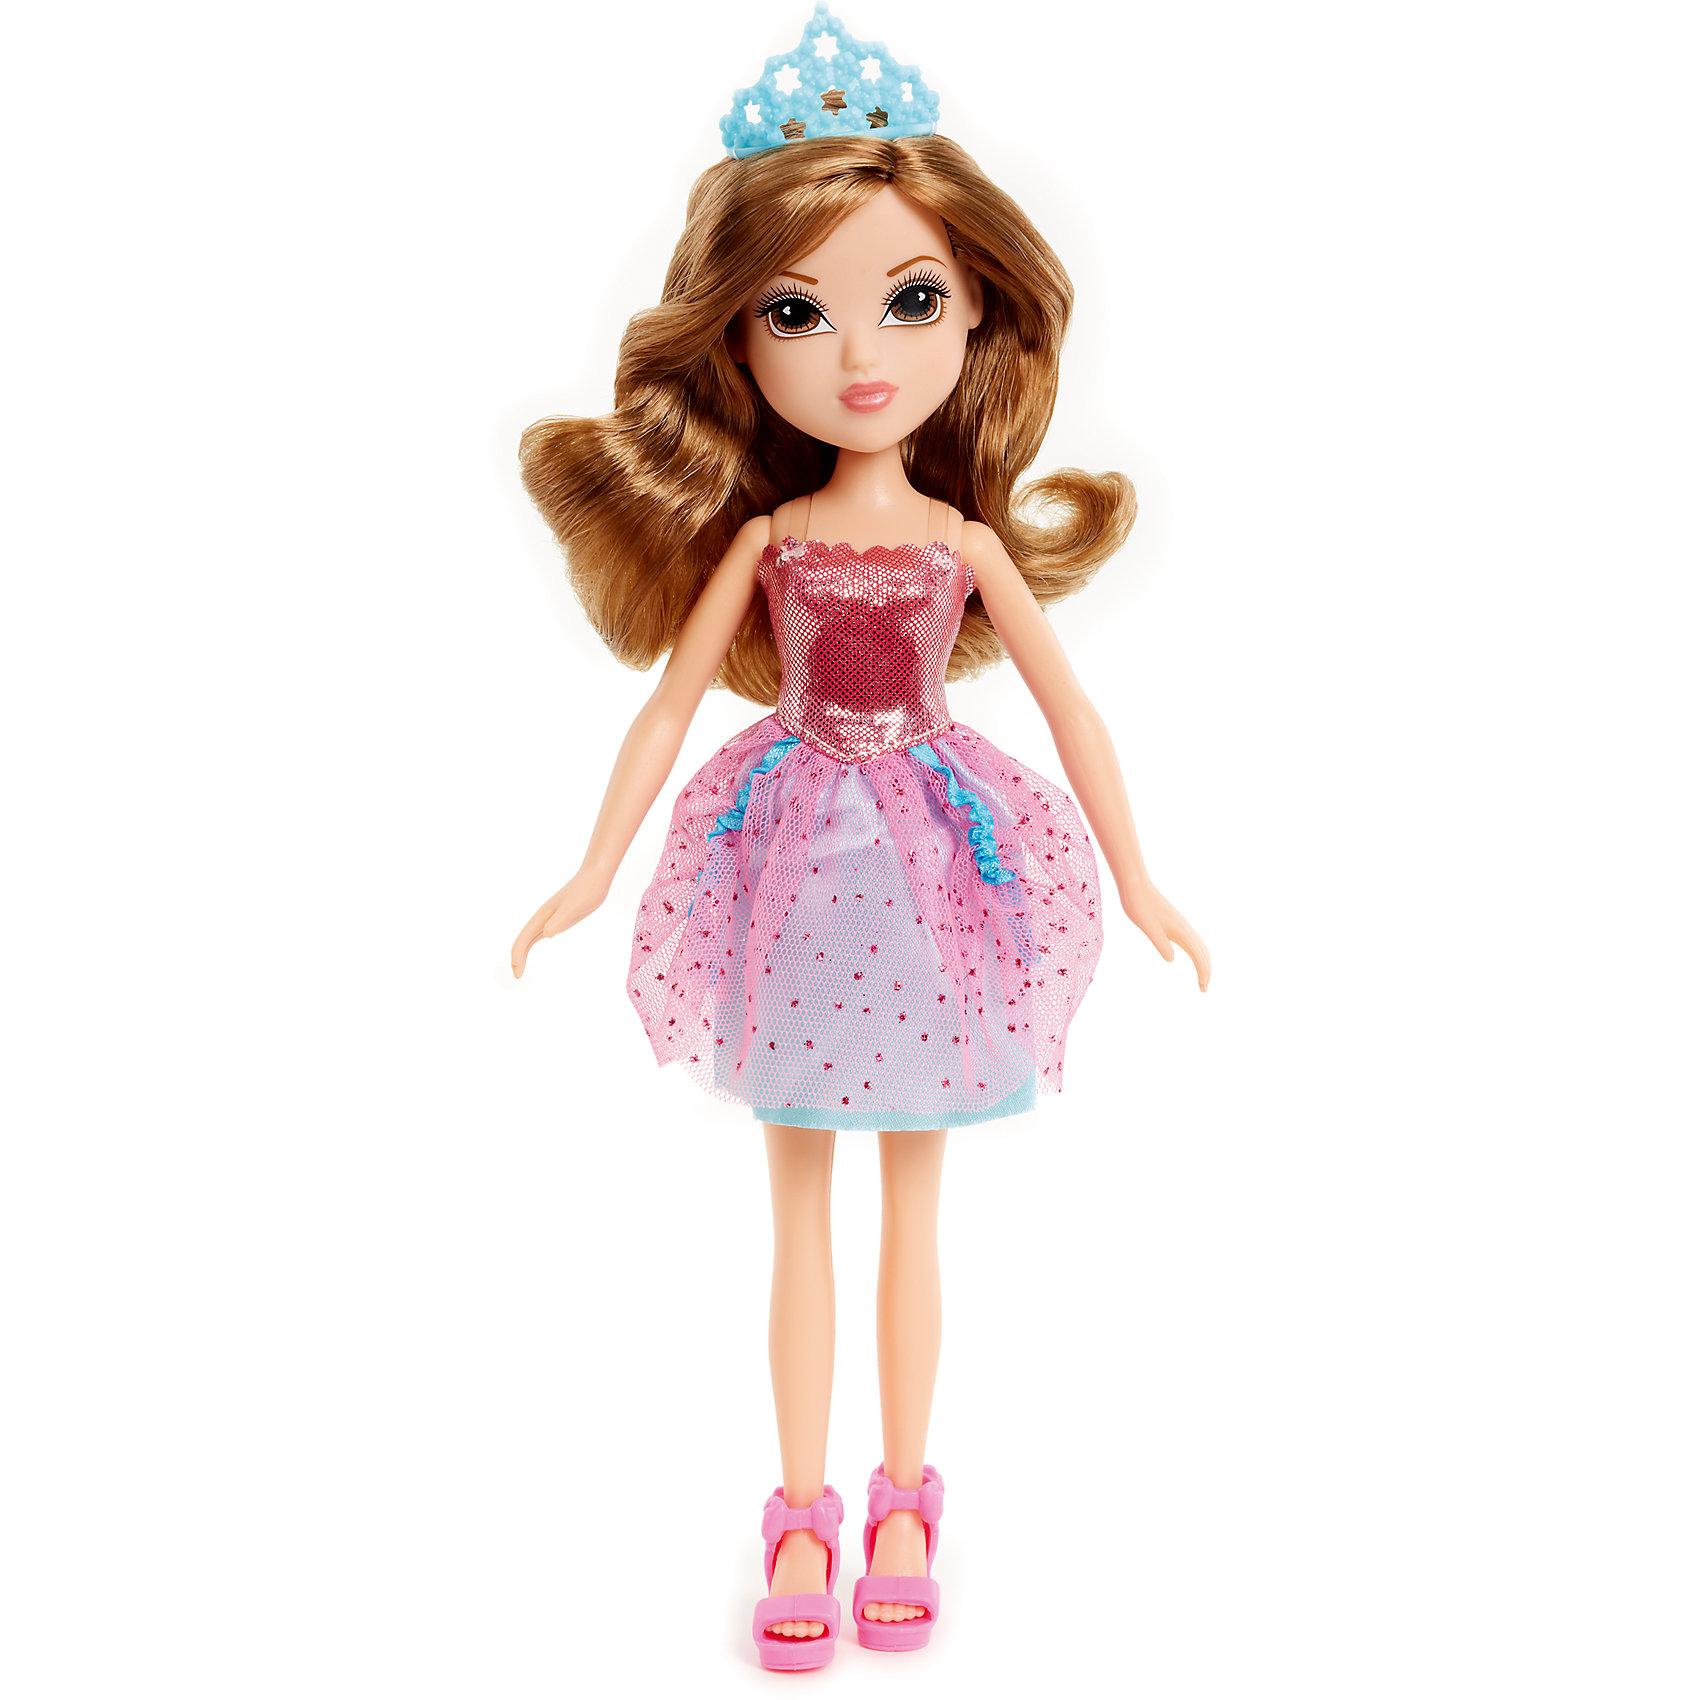 Moxie Принцесса в розовом платье, Moxie купить в москве хсн одежда